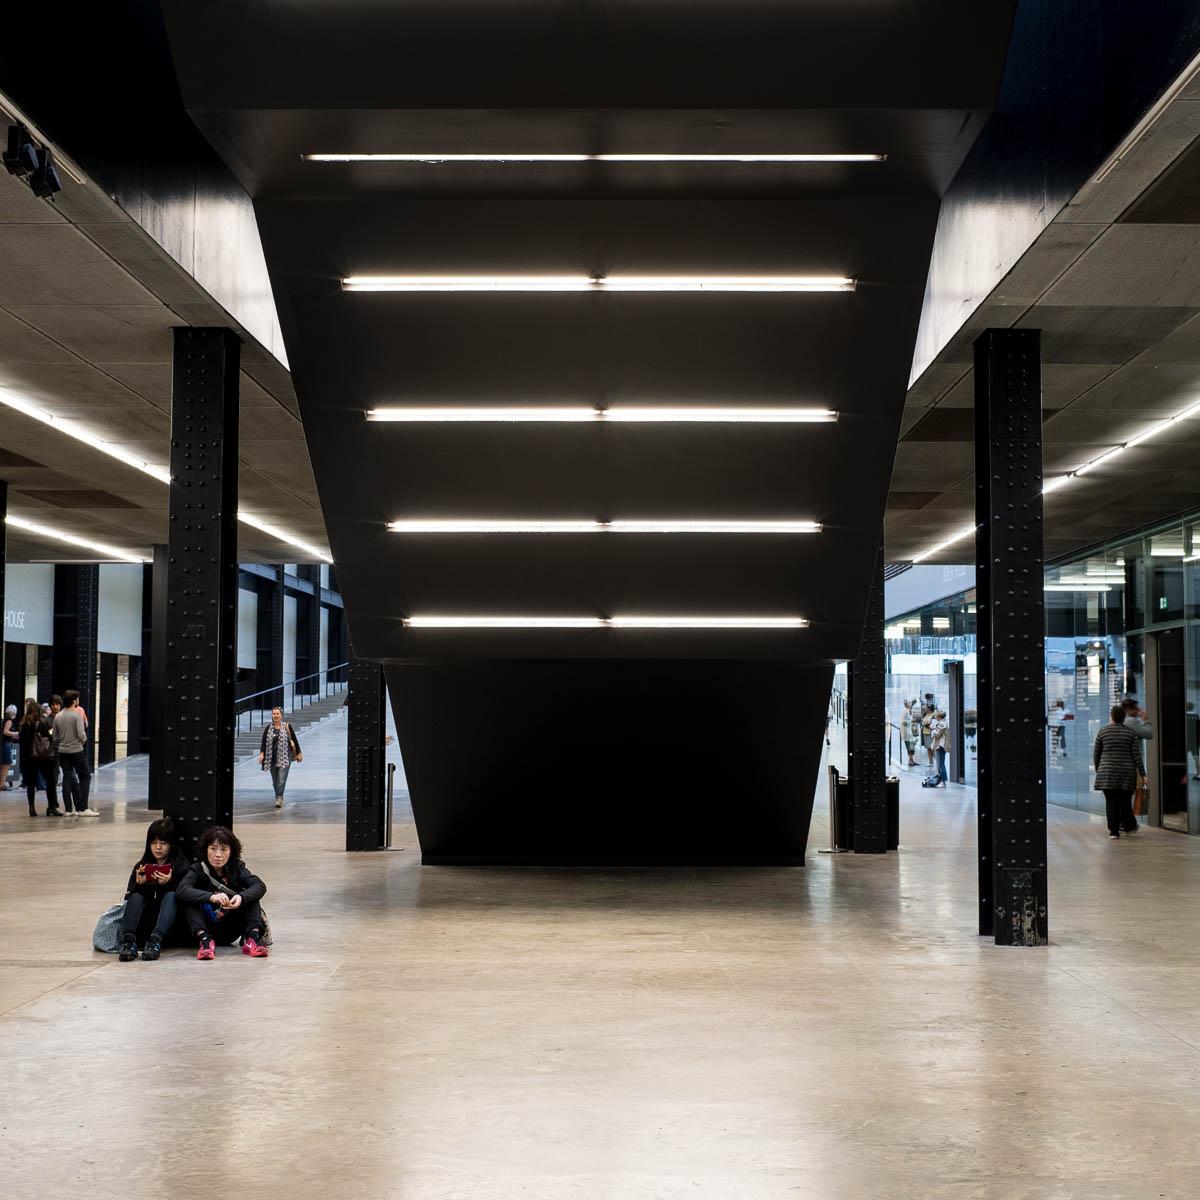 London Architektur Tate Modern